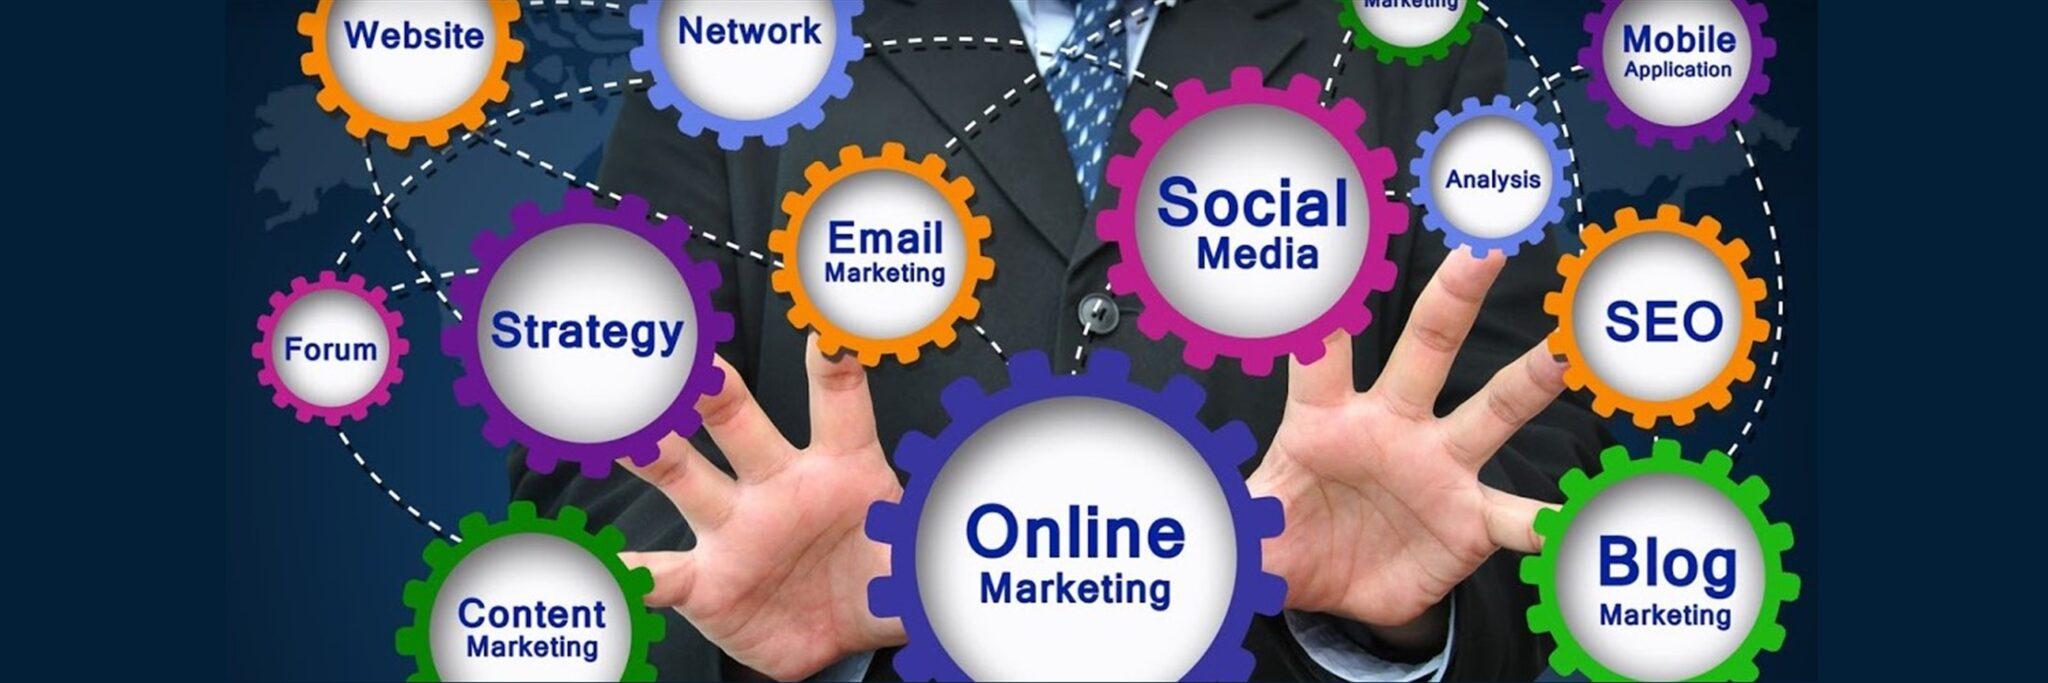 marketing ad agency